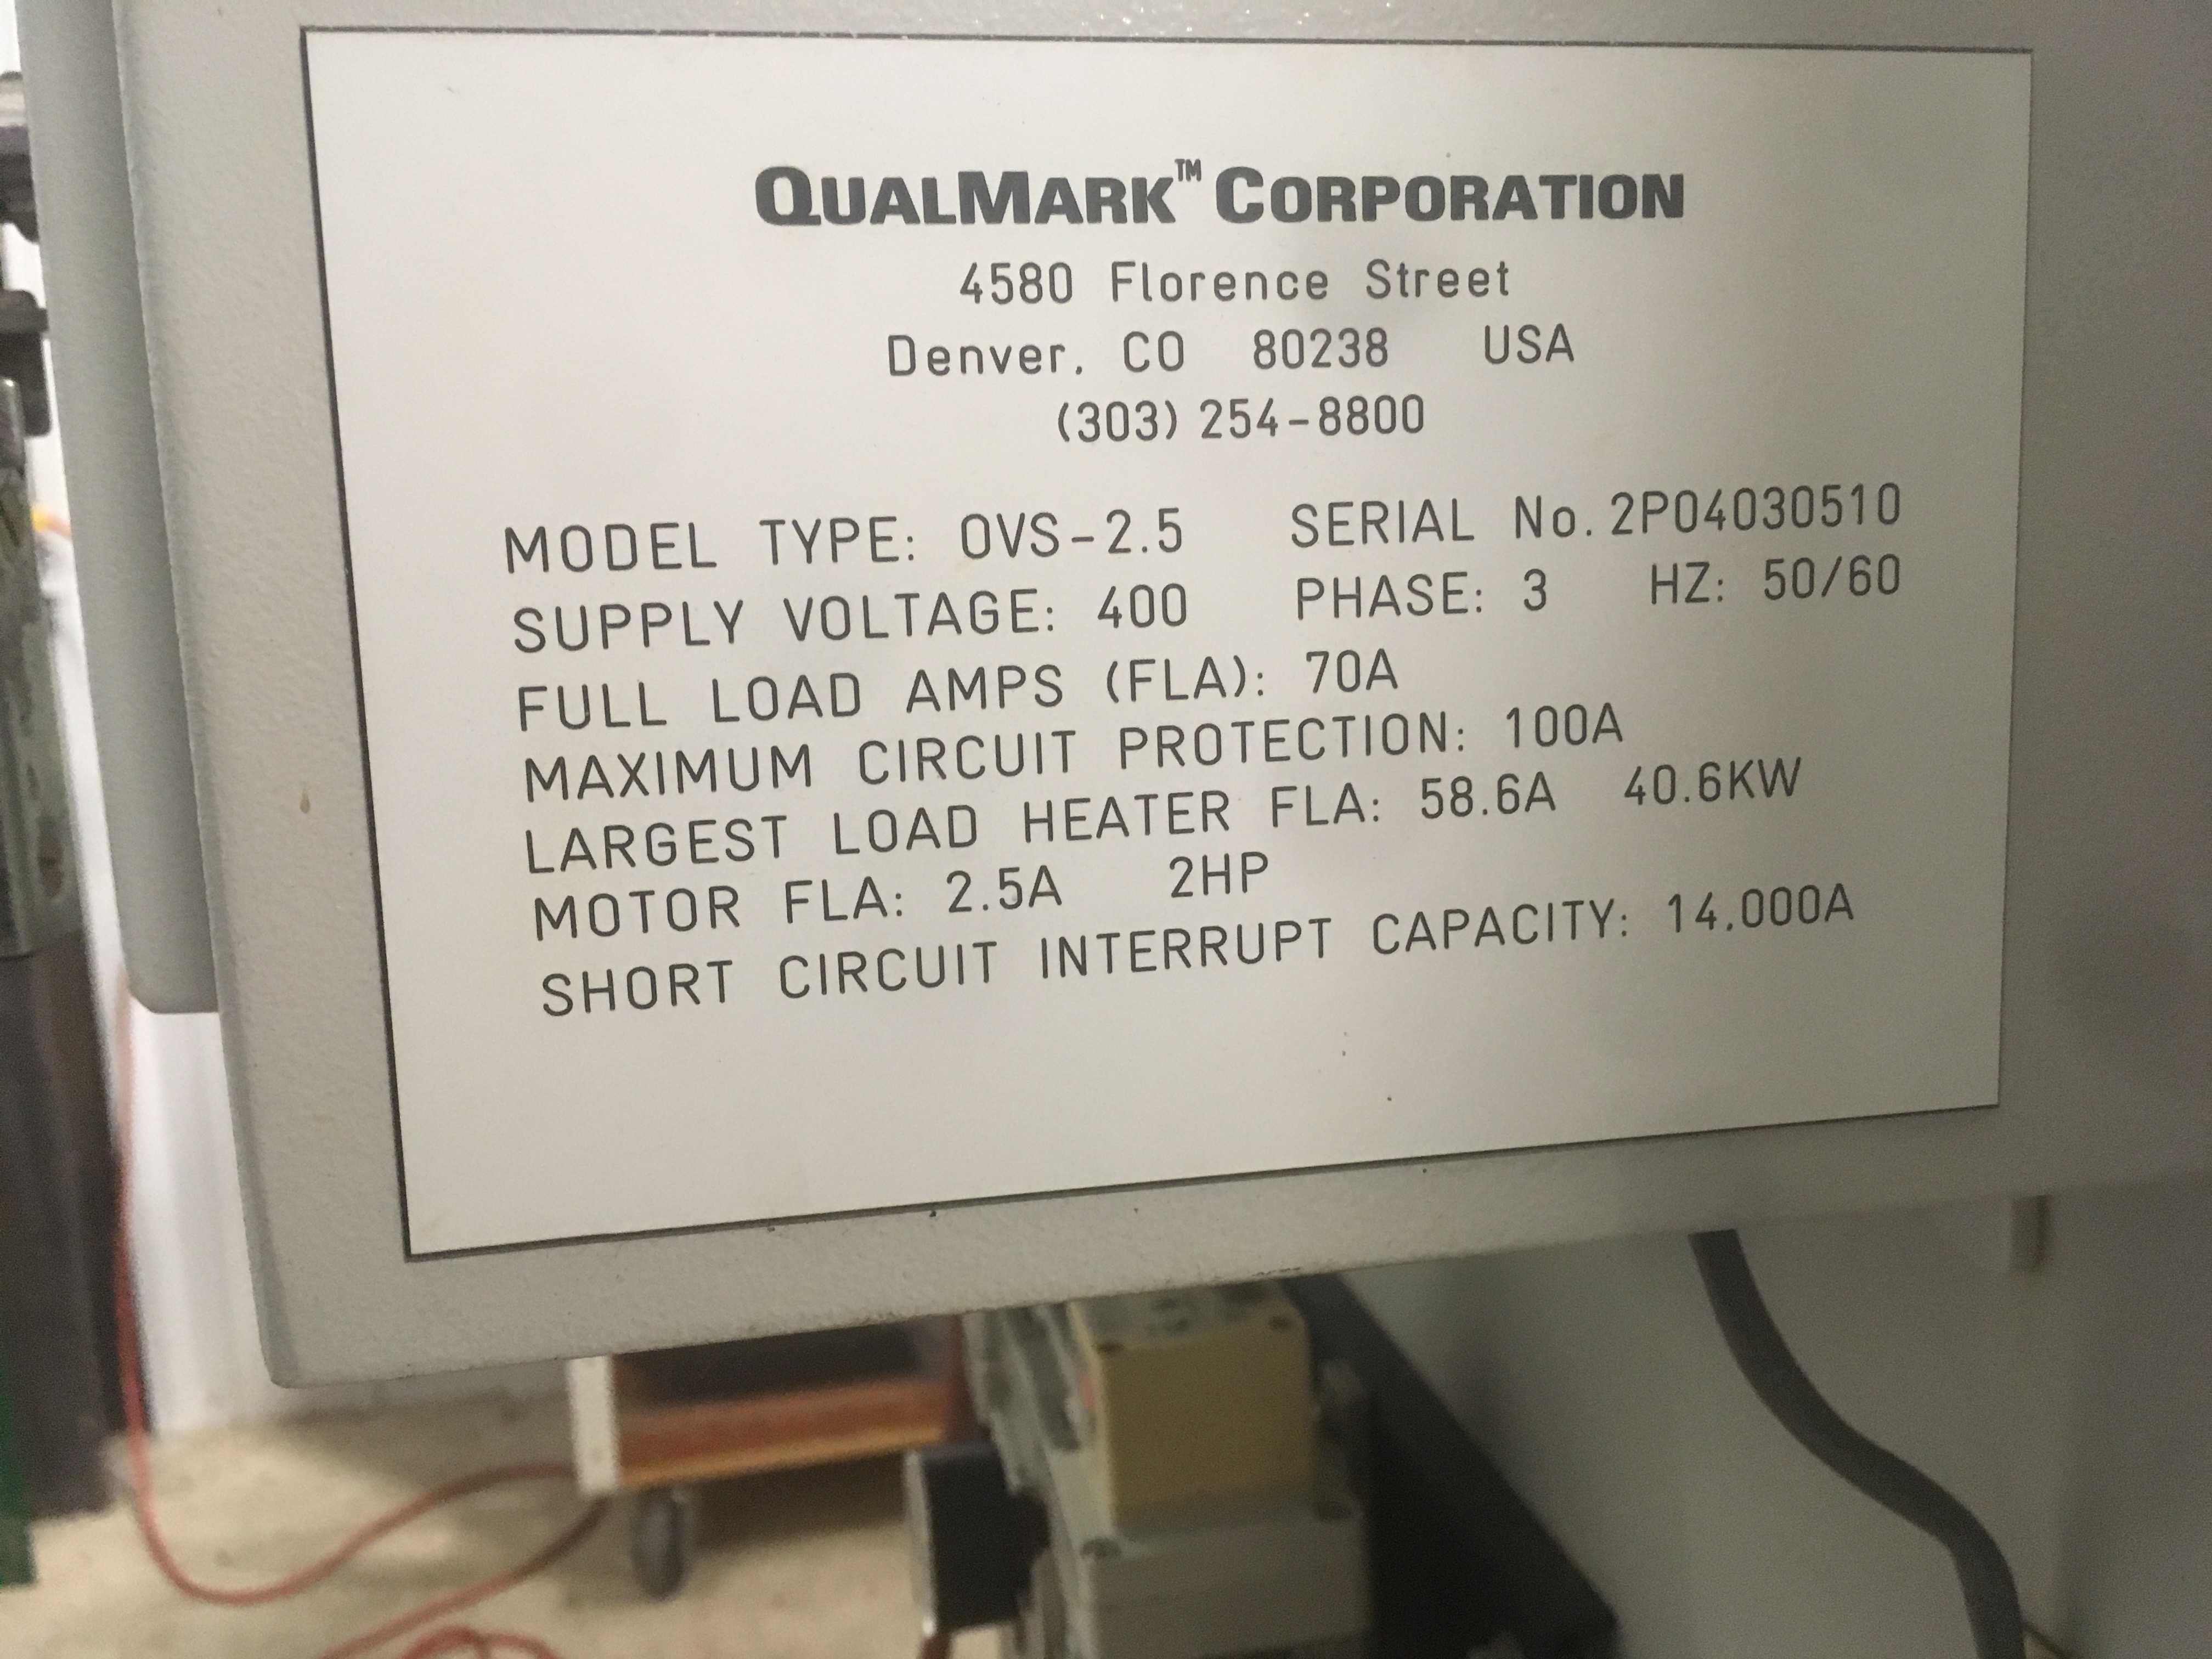 Qualmark OVS 2.5 HALT chamber with lots of upgrades